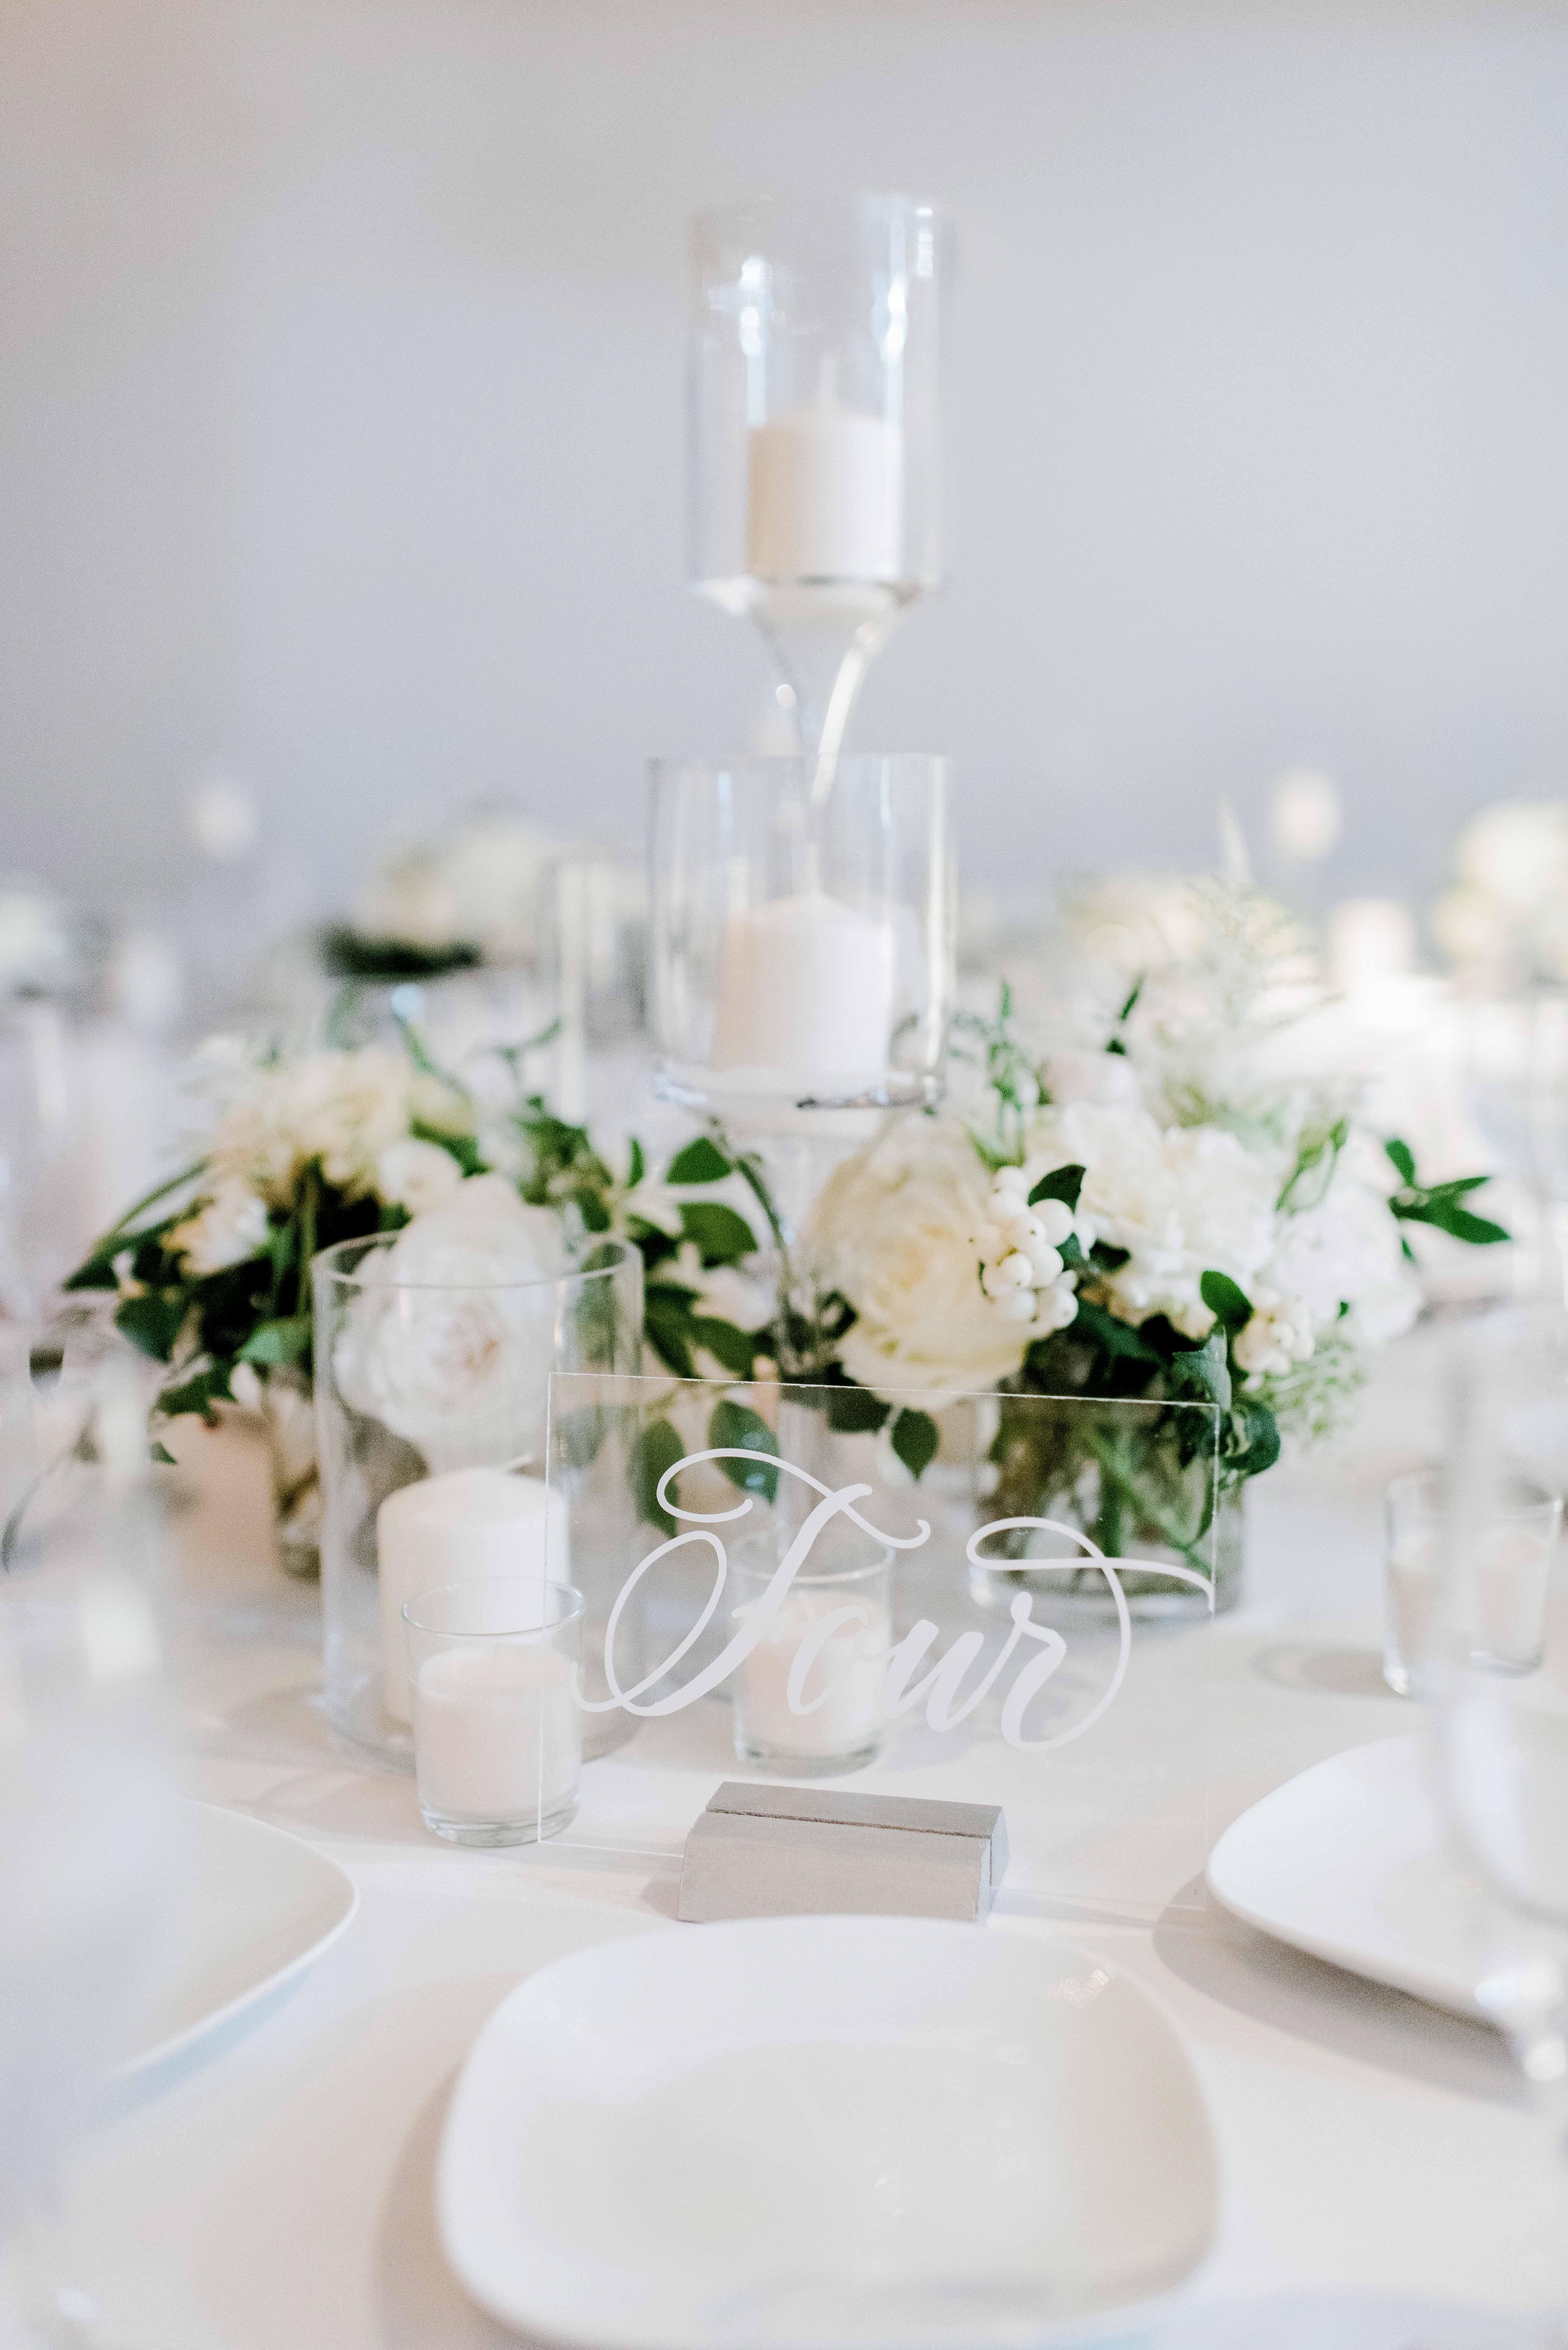 winter wedding centerpieces rachel pearlman photography